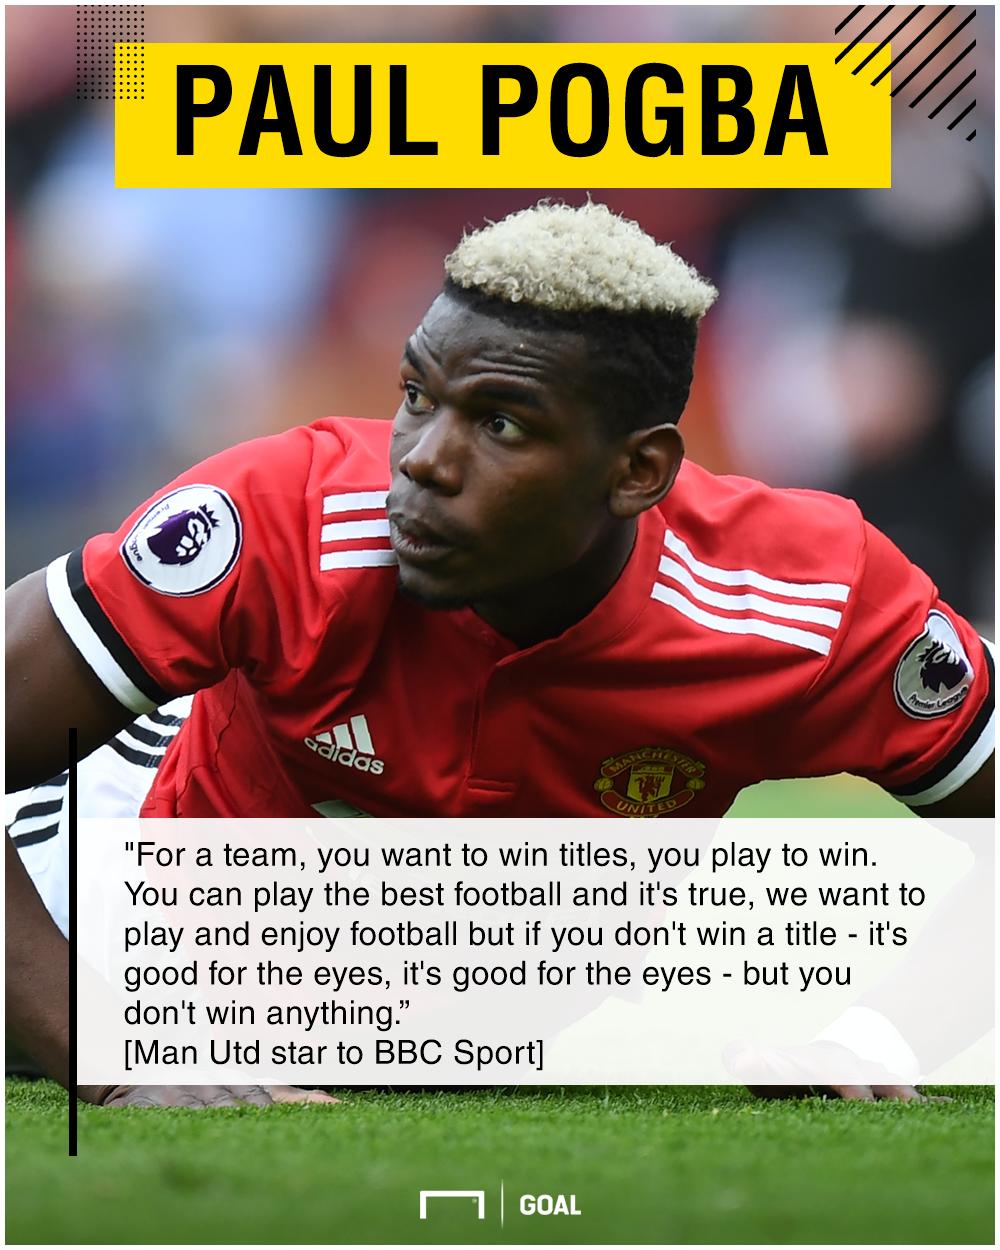 Paul Pogba Manchester United winning all that matters